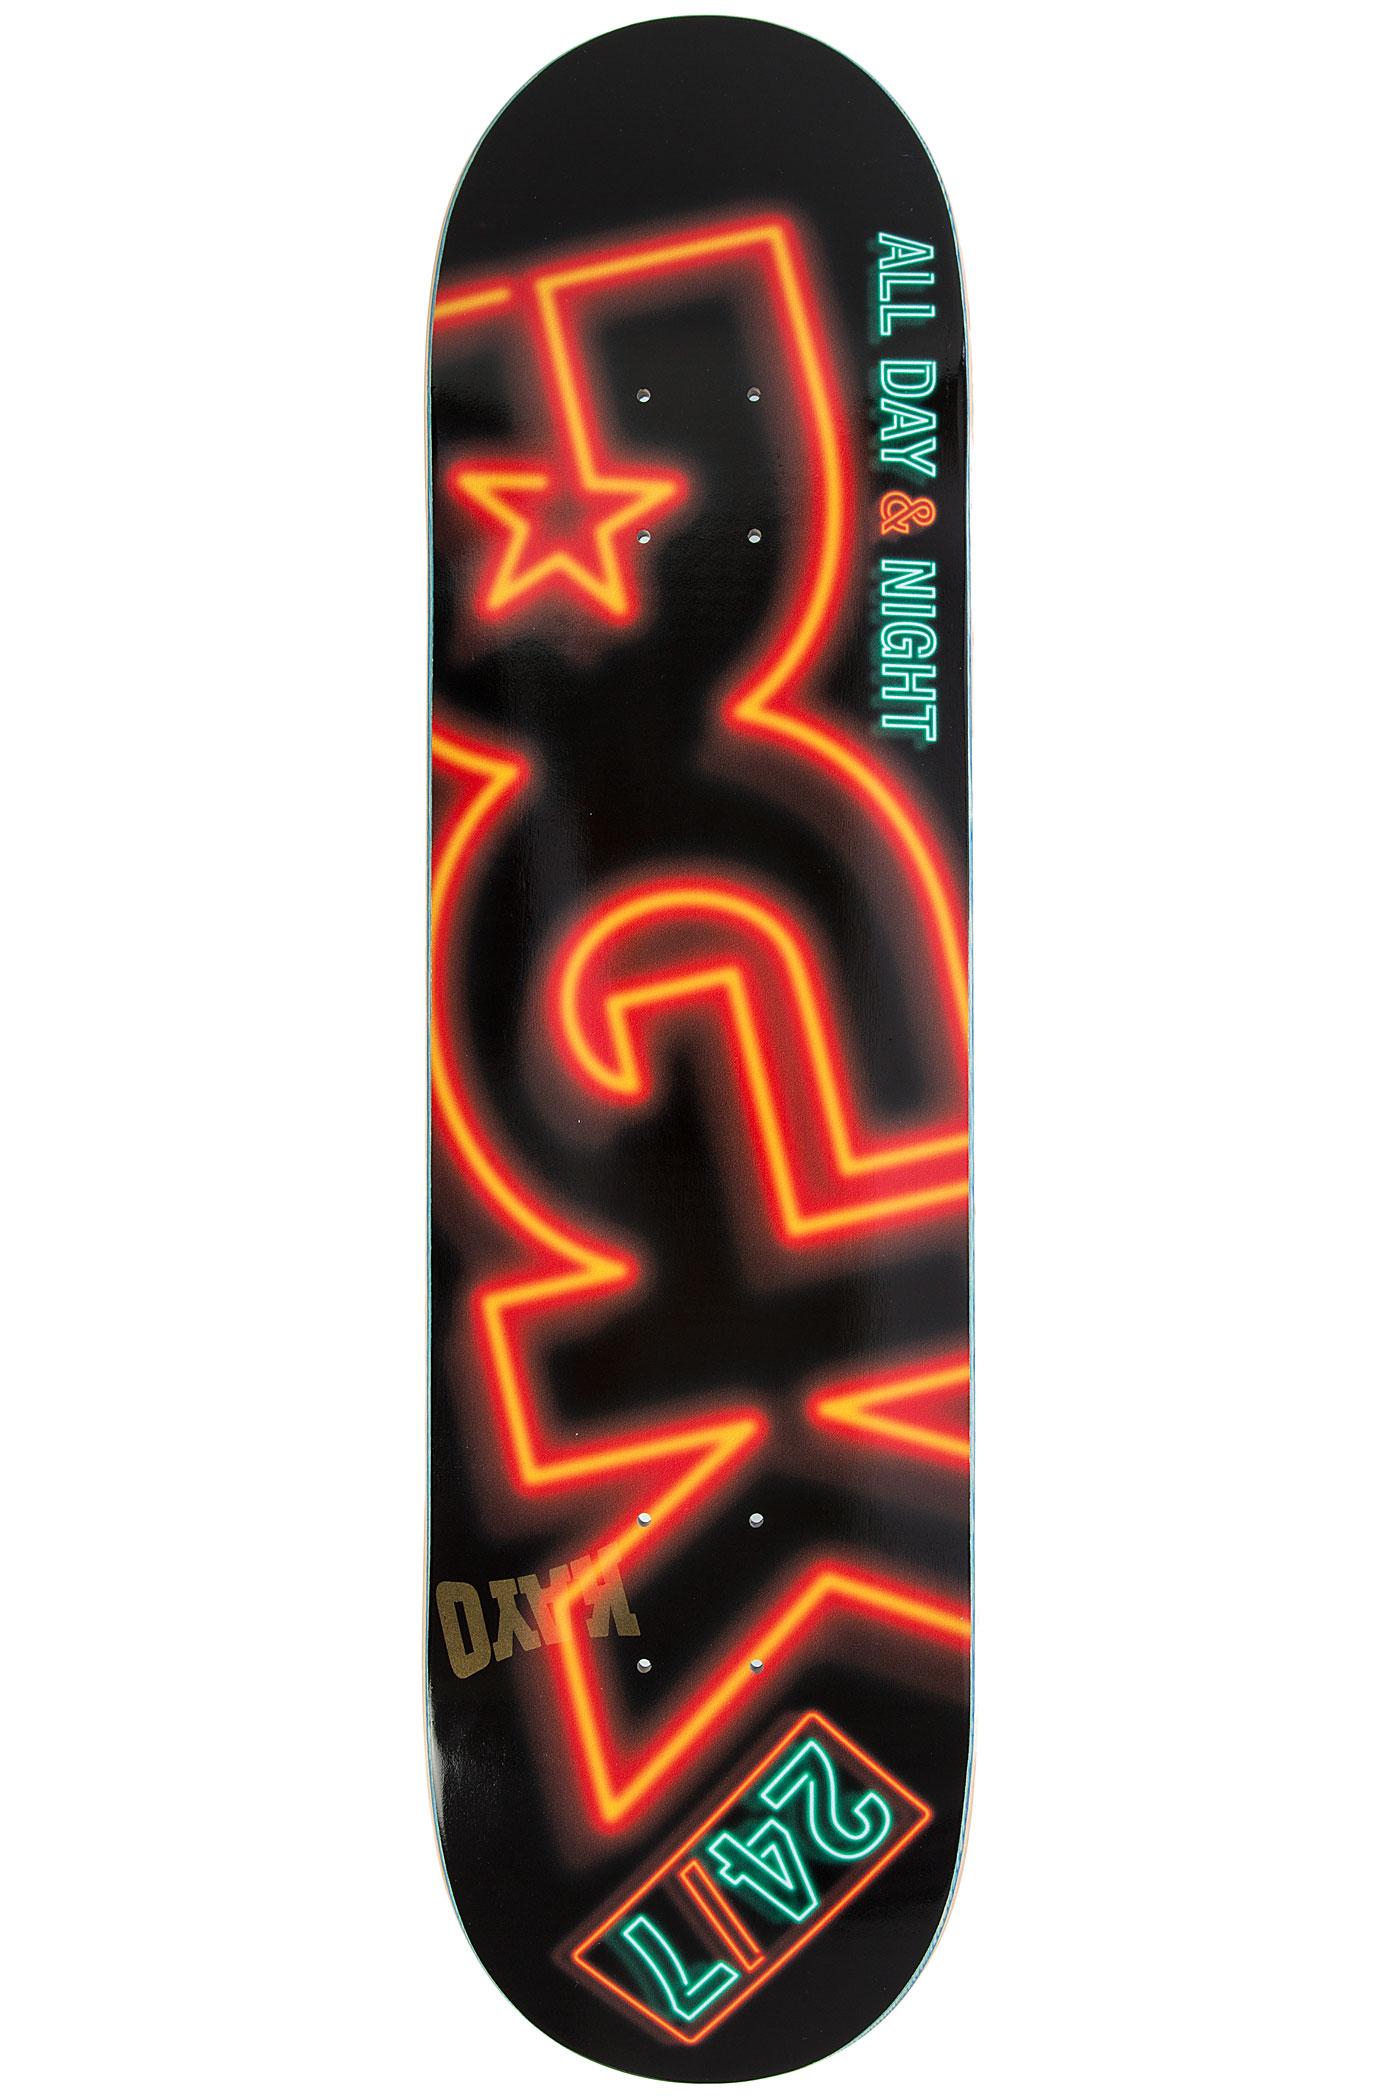 Dgk Skateboards Team 24 7 Deck Black Buy At